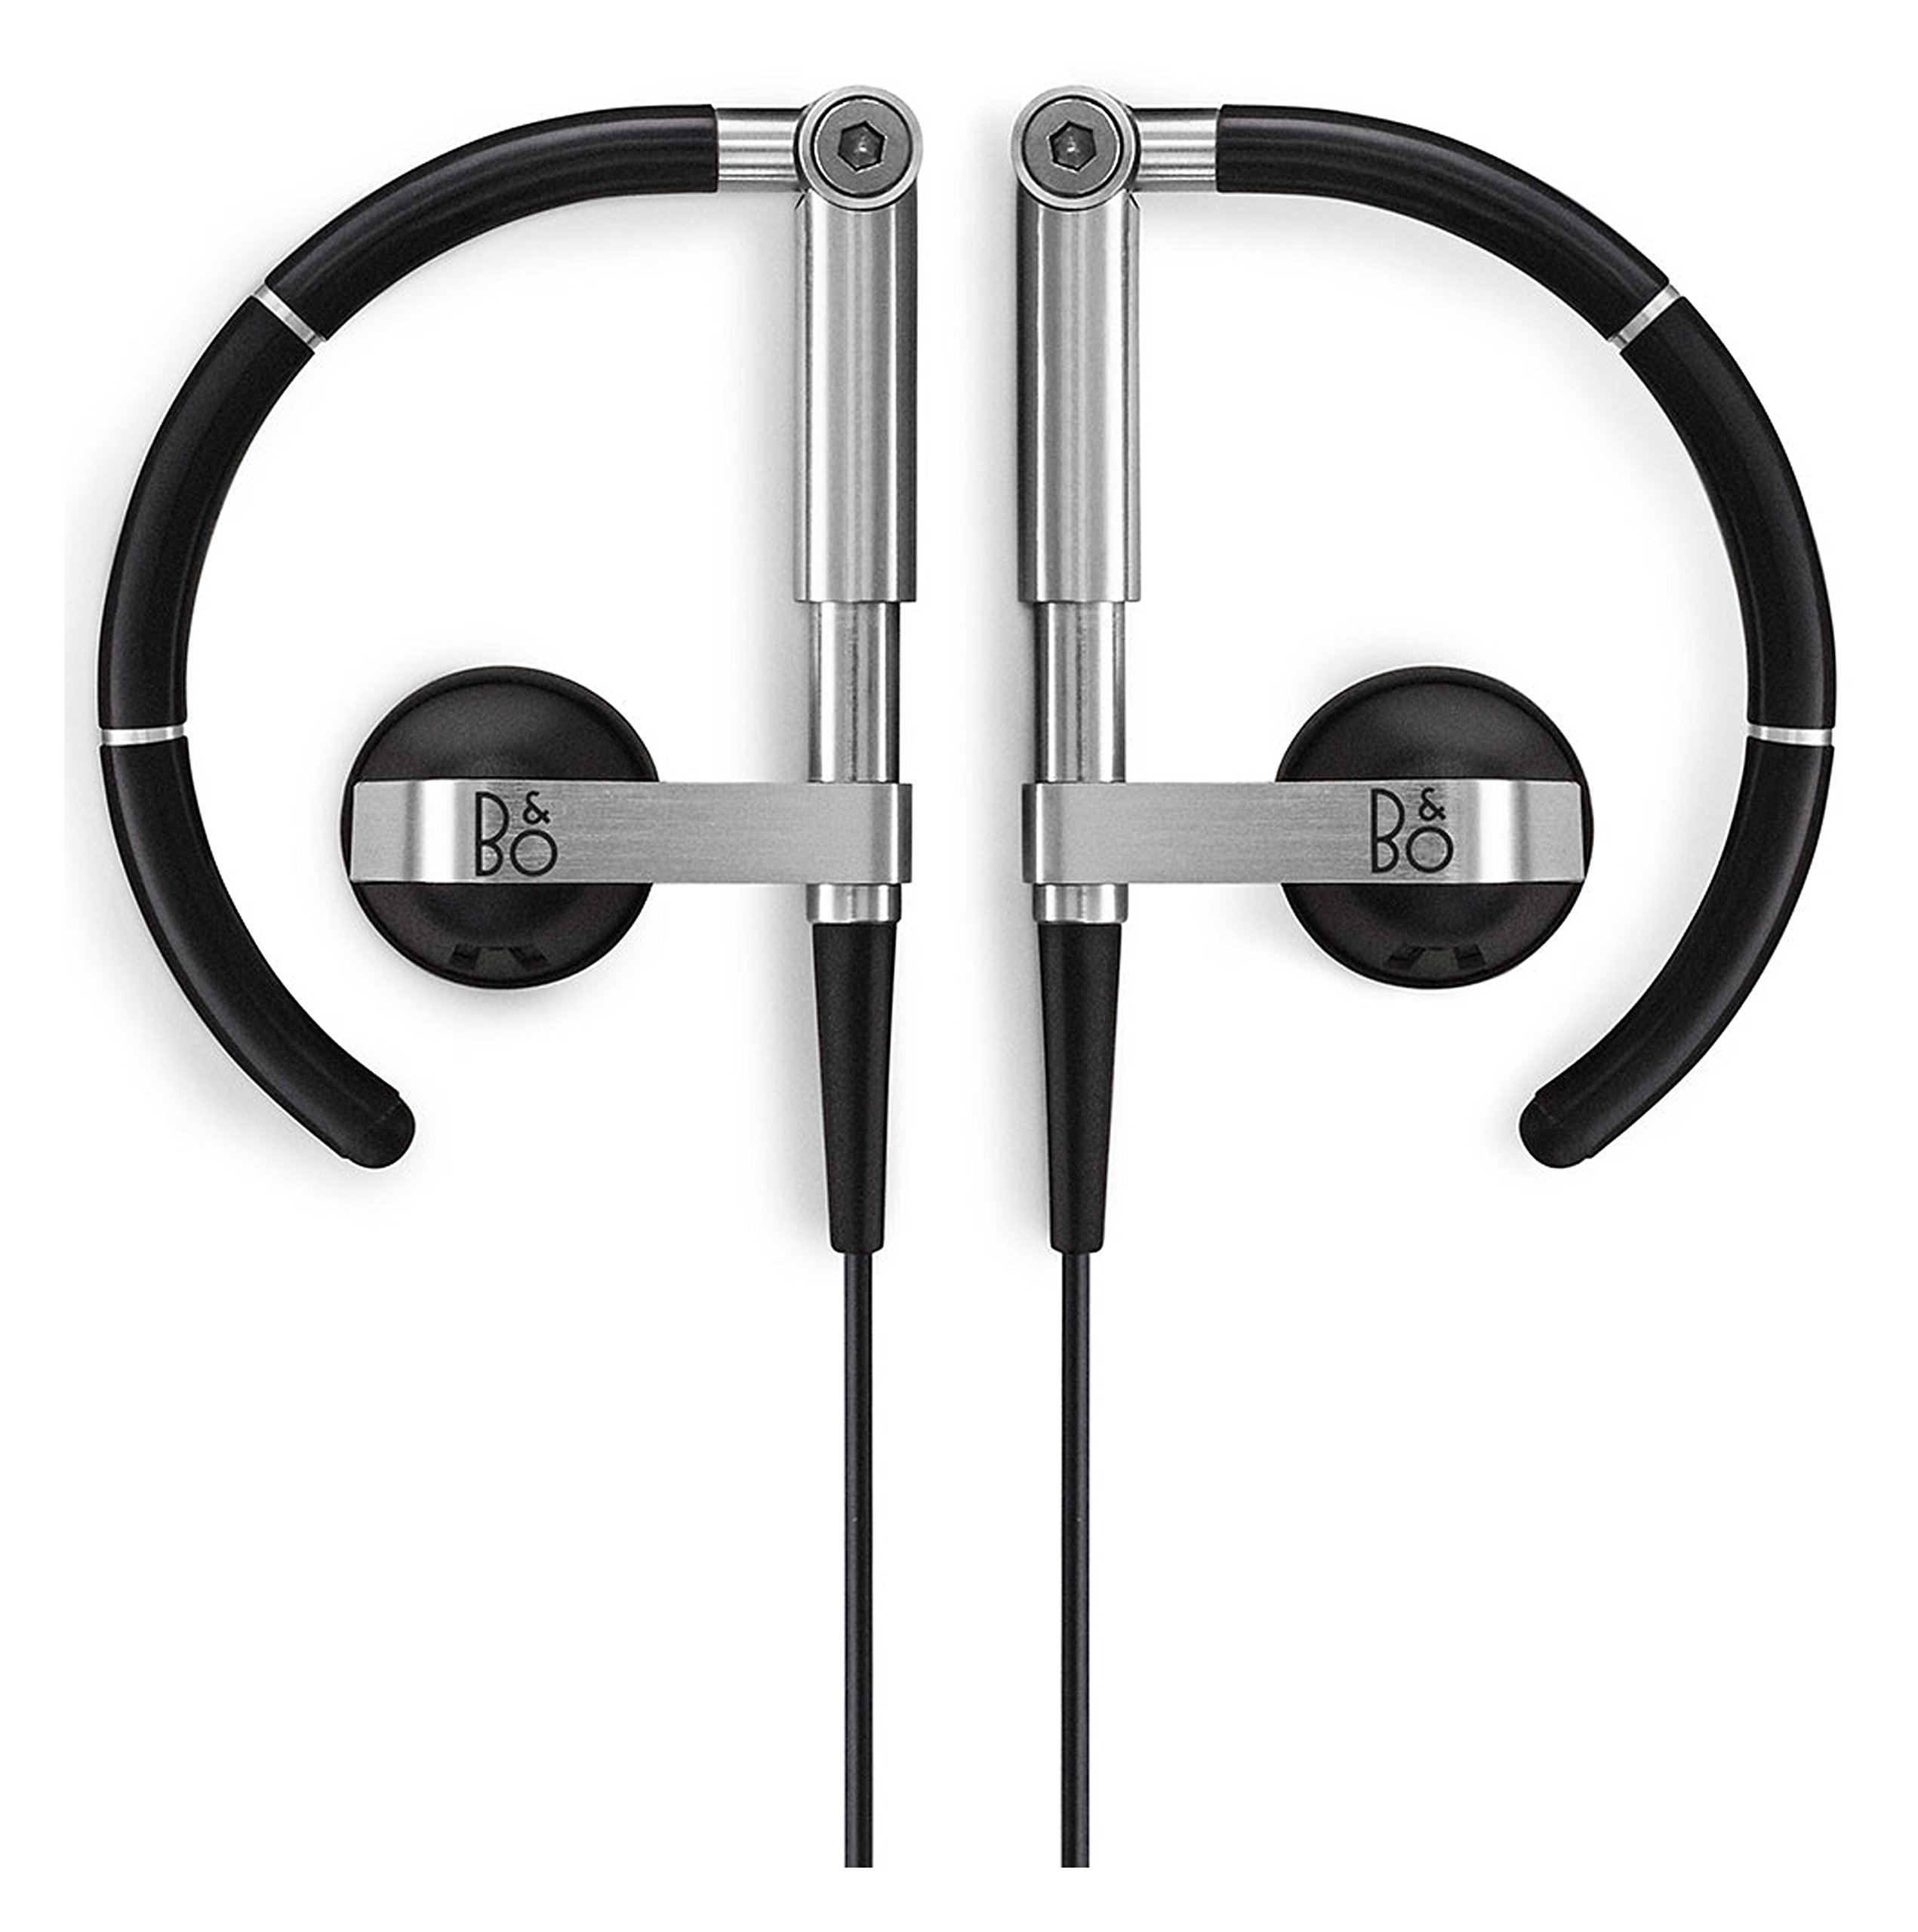 B&O PLAY by Bang & Olufsen 1108426 Beoplay Earset 3i Active Earphone Headphone (Black)